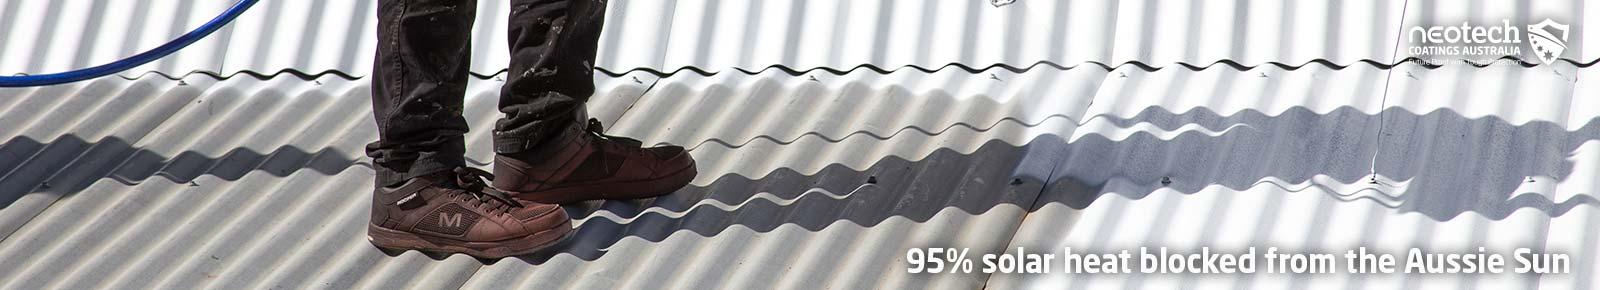 Super Therm 95% Solar Heat Block from the Australian Sun